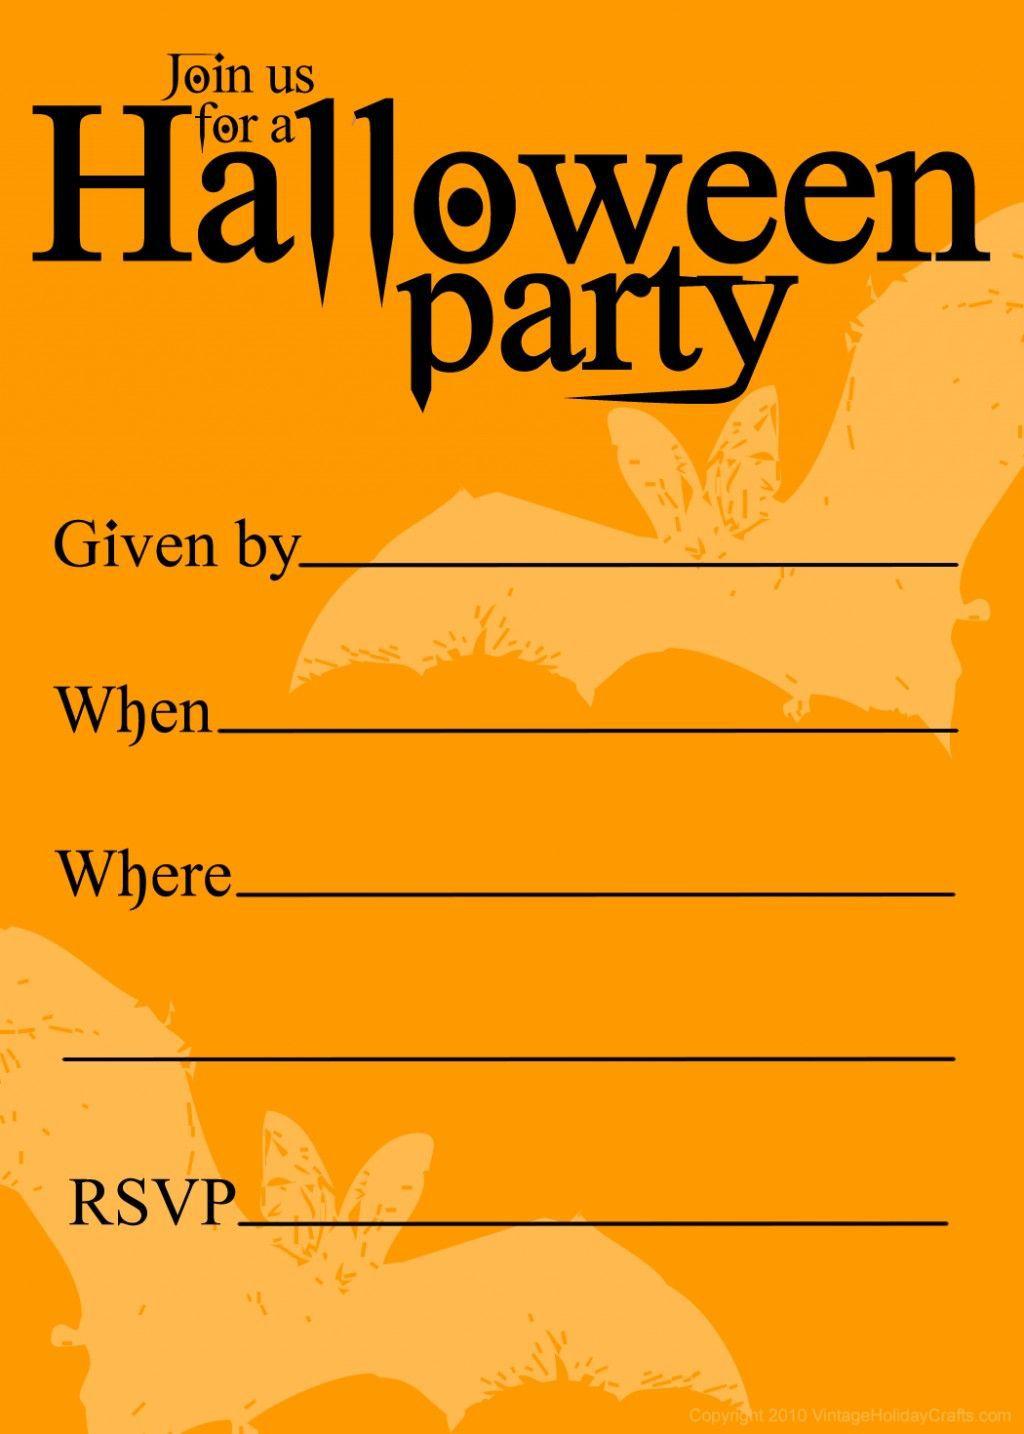 003 Surprising Halloween Party Invitation Template Picture  Microsoft Block OctoberFull